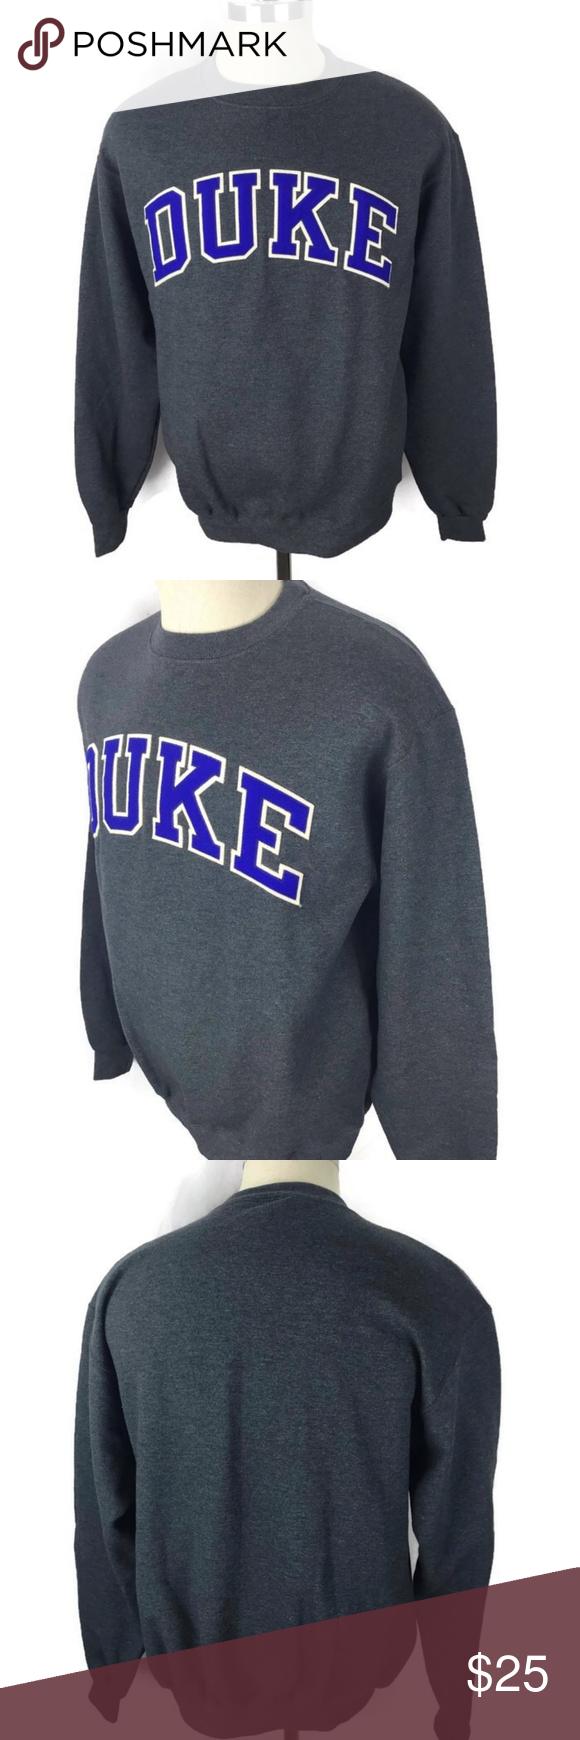 Champion Eco Fleece Sweatshirt Medium Duke Champion Eco Fleece Sweatshirt Duke University Medium Gray Chest Sweatshirt Fleece Sweatshirts Sweatshirt Shirt [ 1740 x 580 Pixel ]